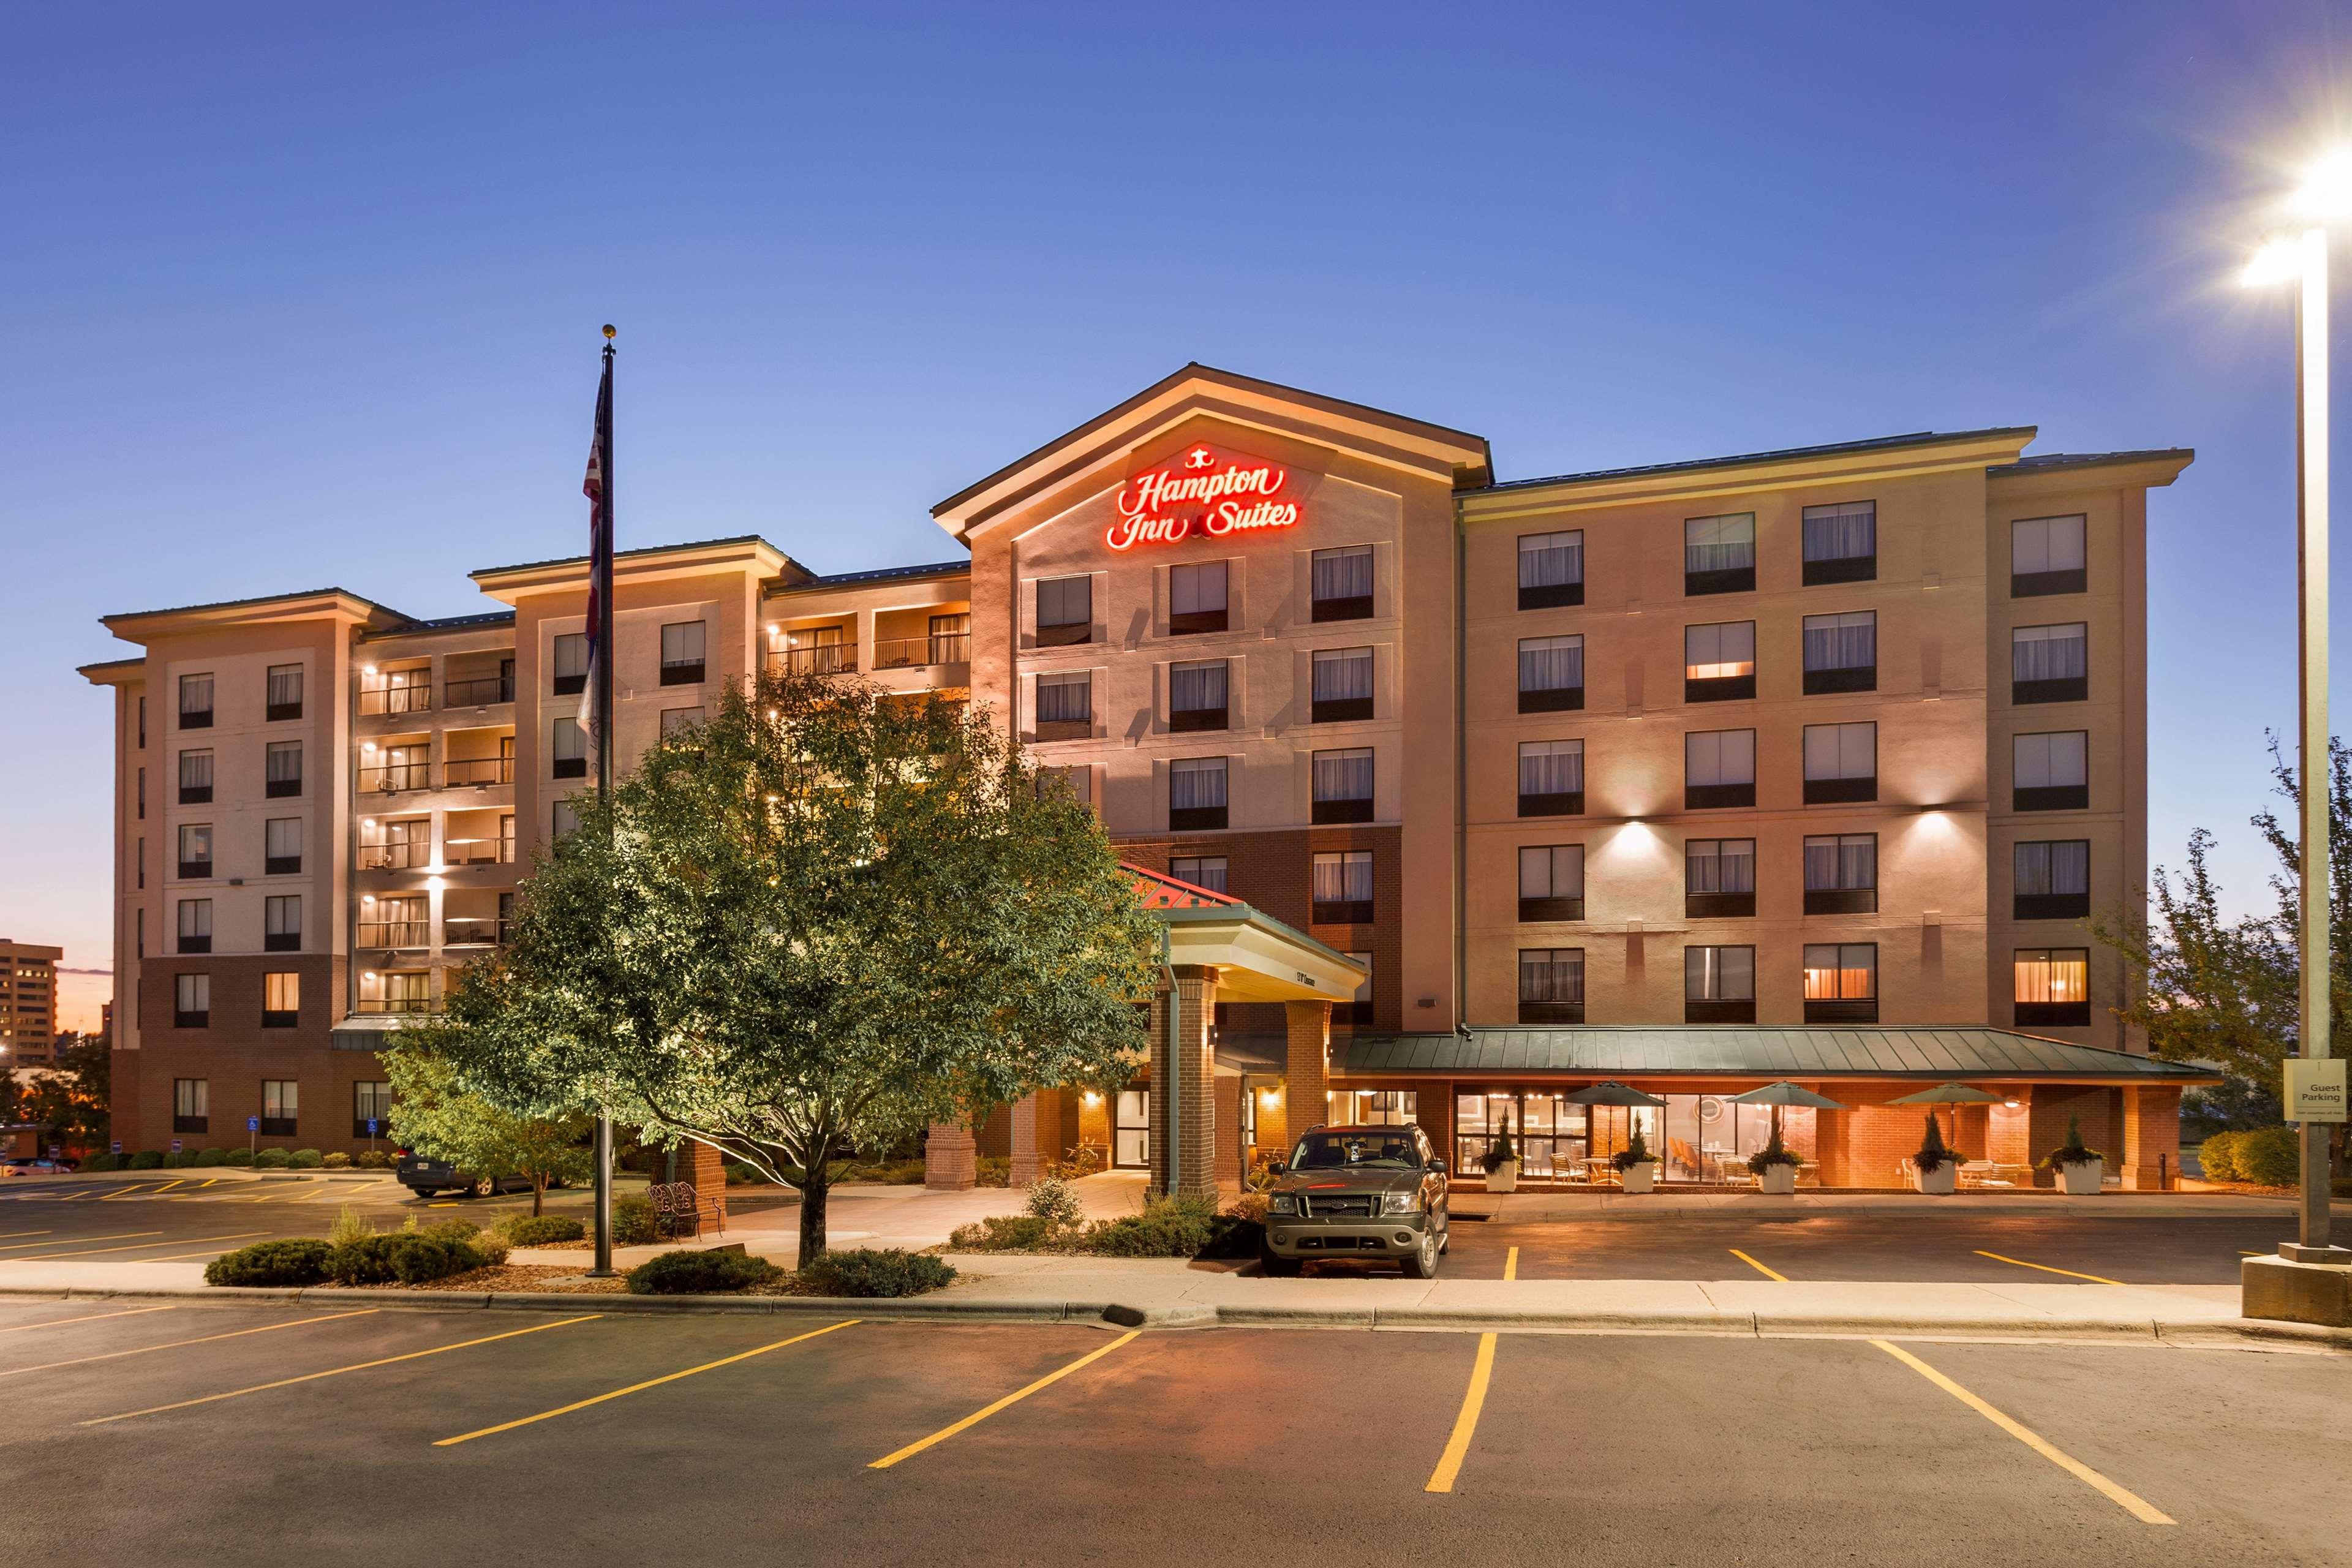 Hampton Inn & Suites Denver-Cherry Creek image 1